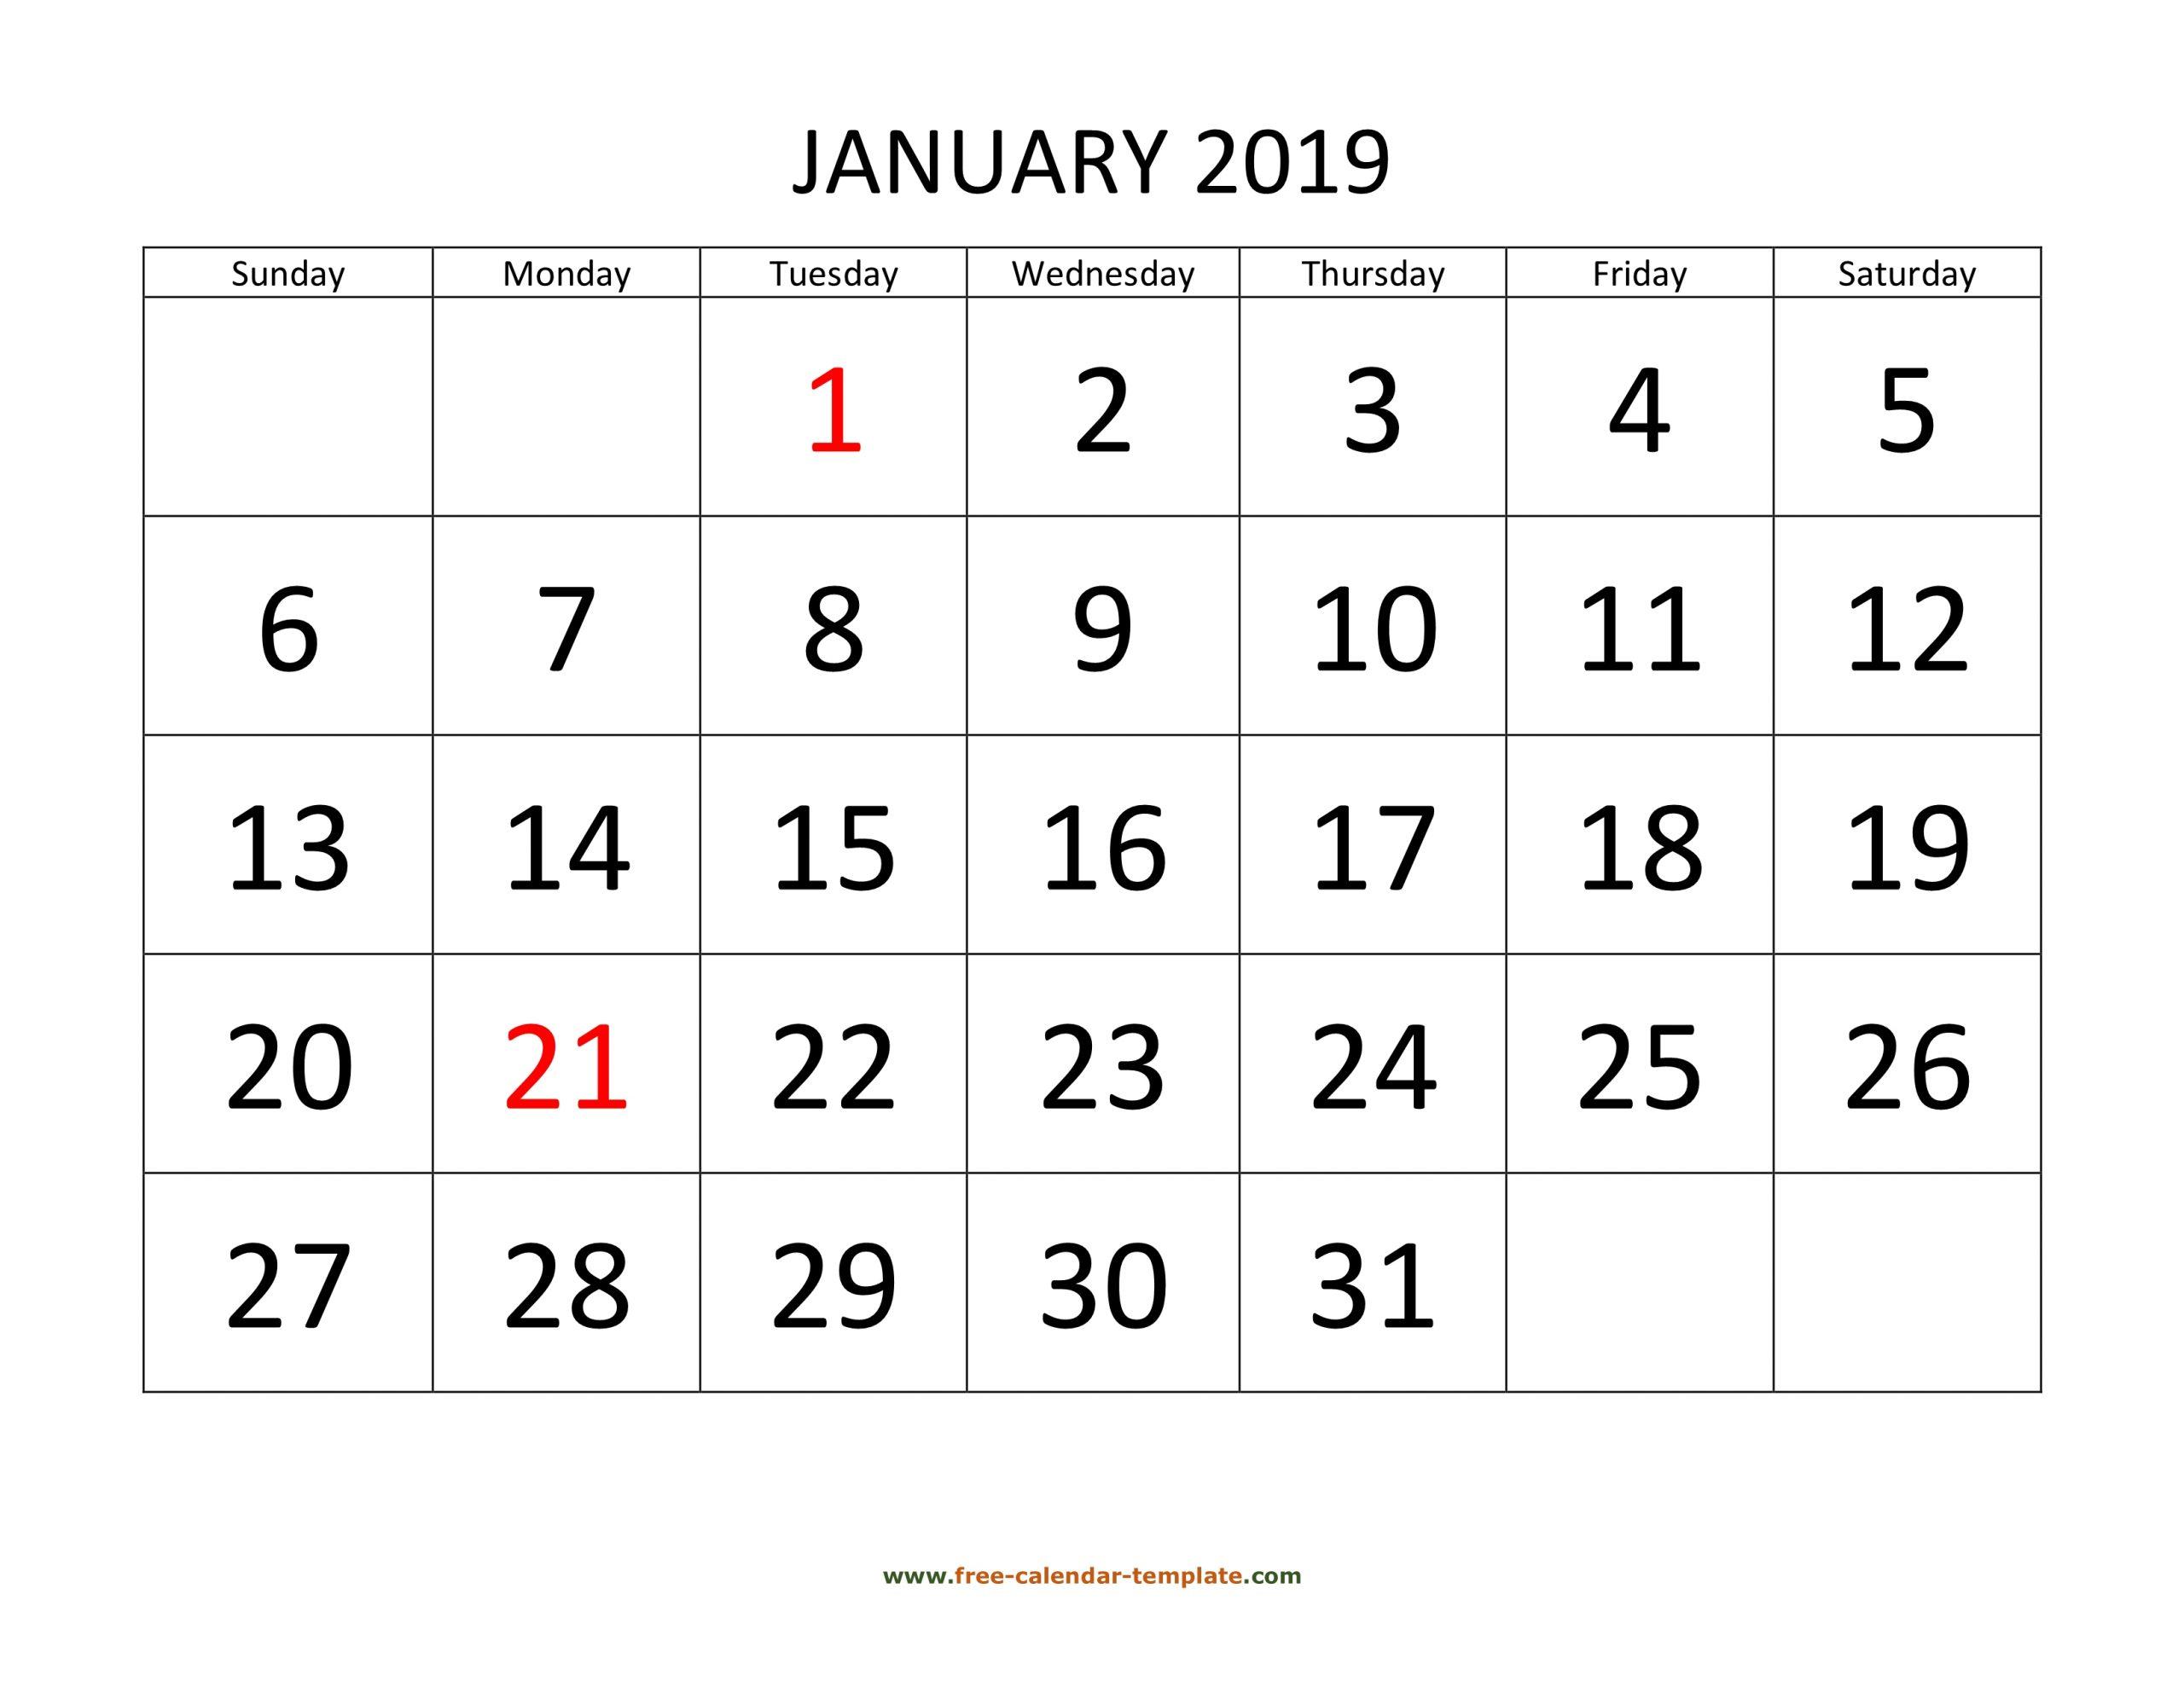 January 2019 Calendar Designed With Large Font (Horizontal